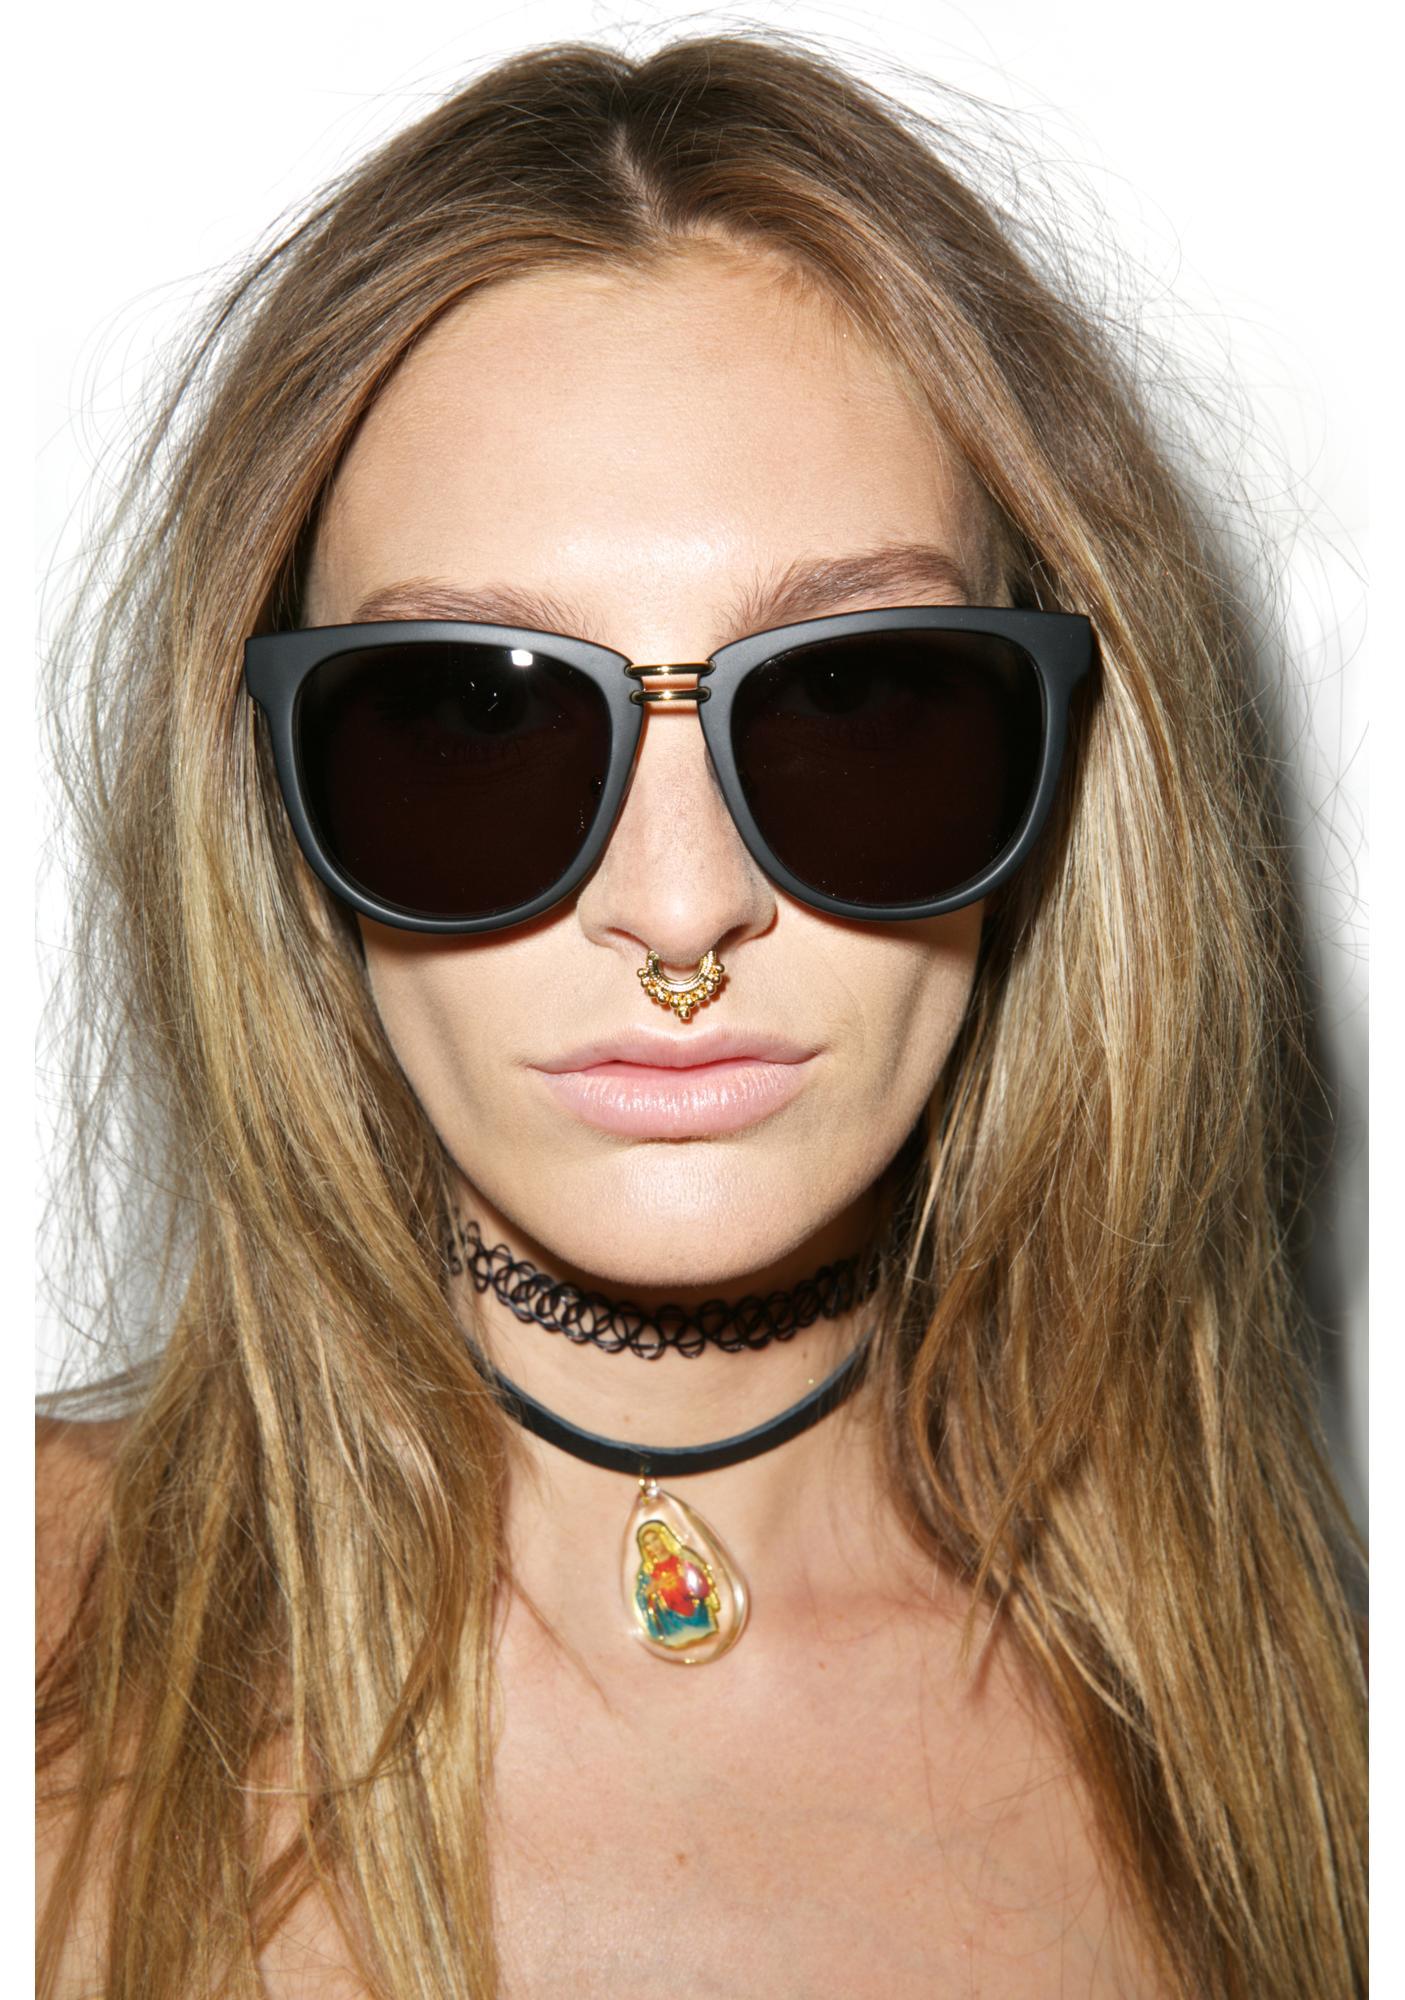 Crap Eyewear The Nudie Max Sunglasses